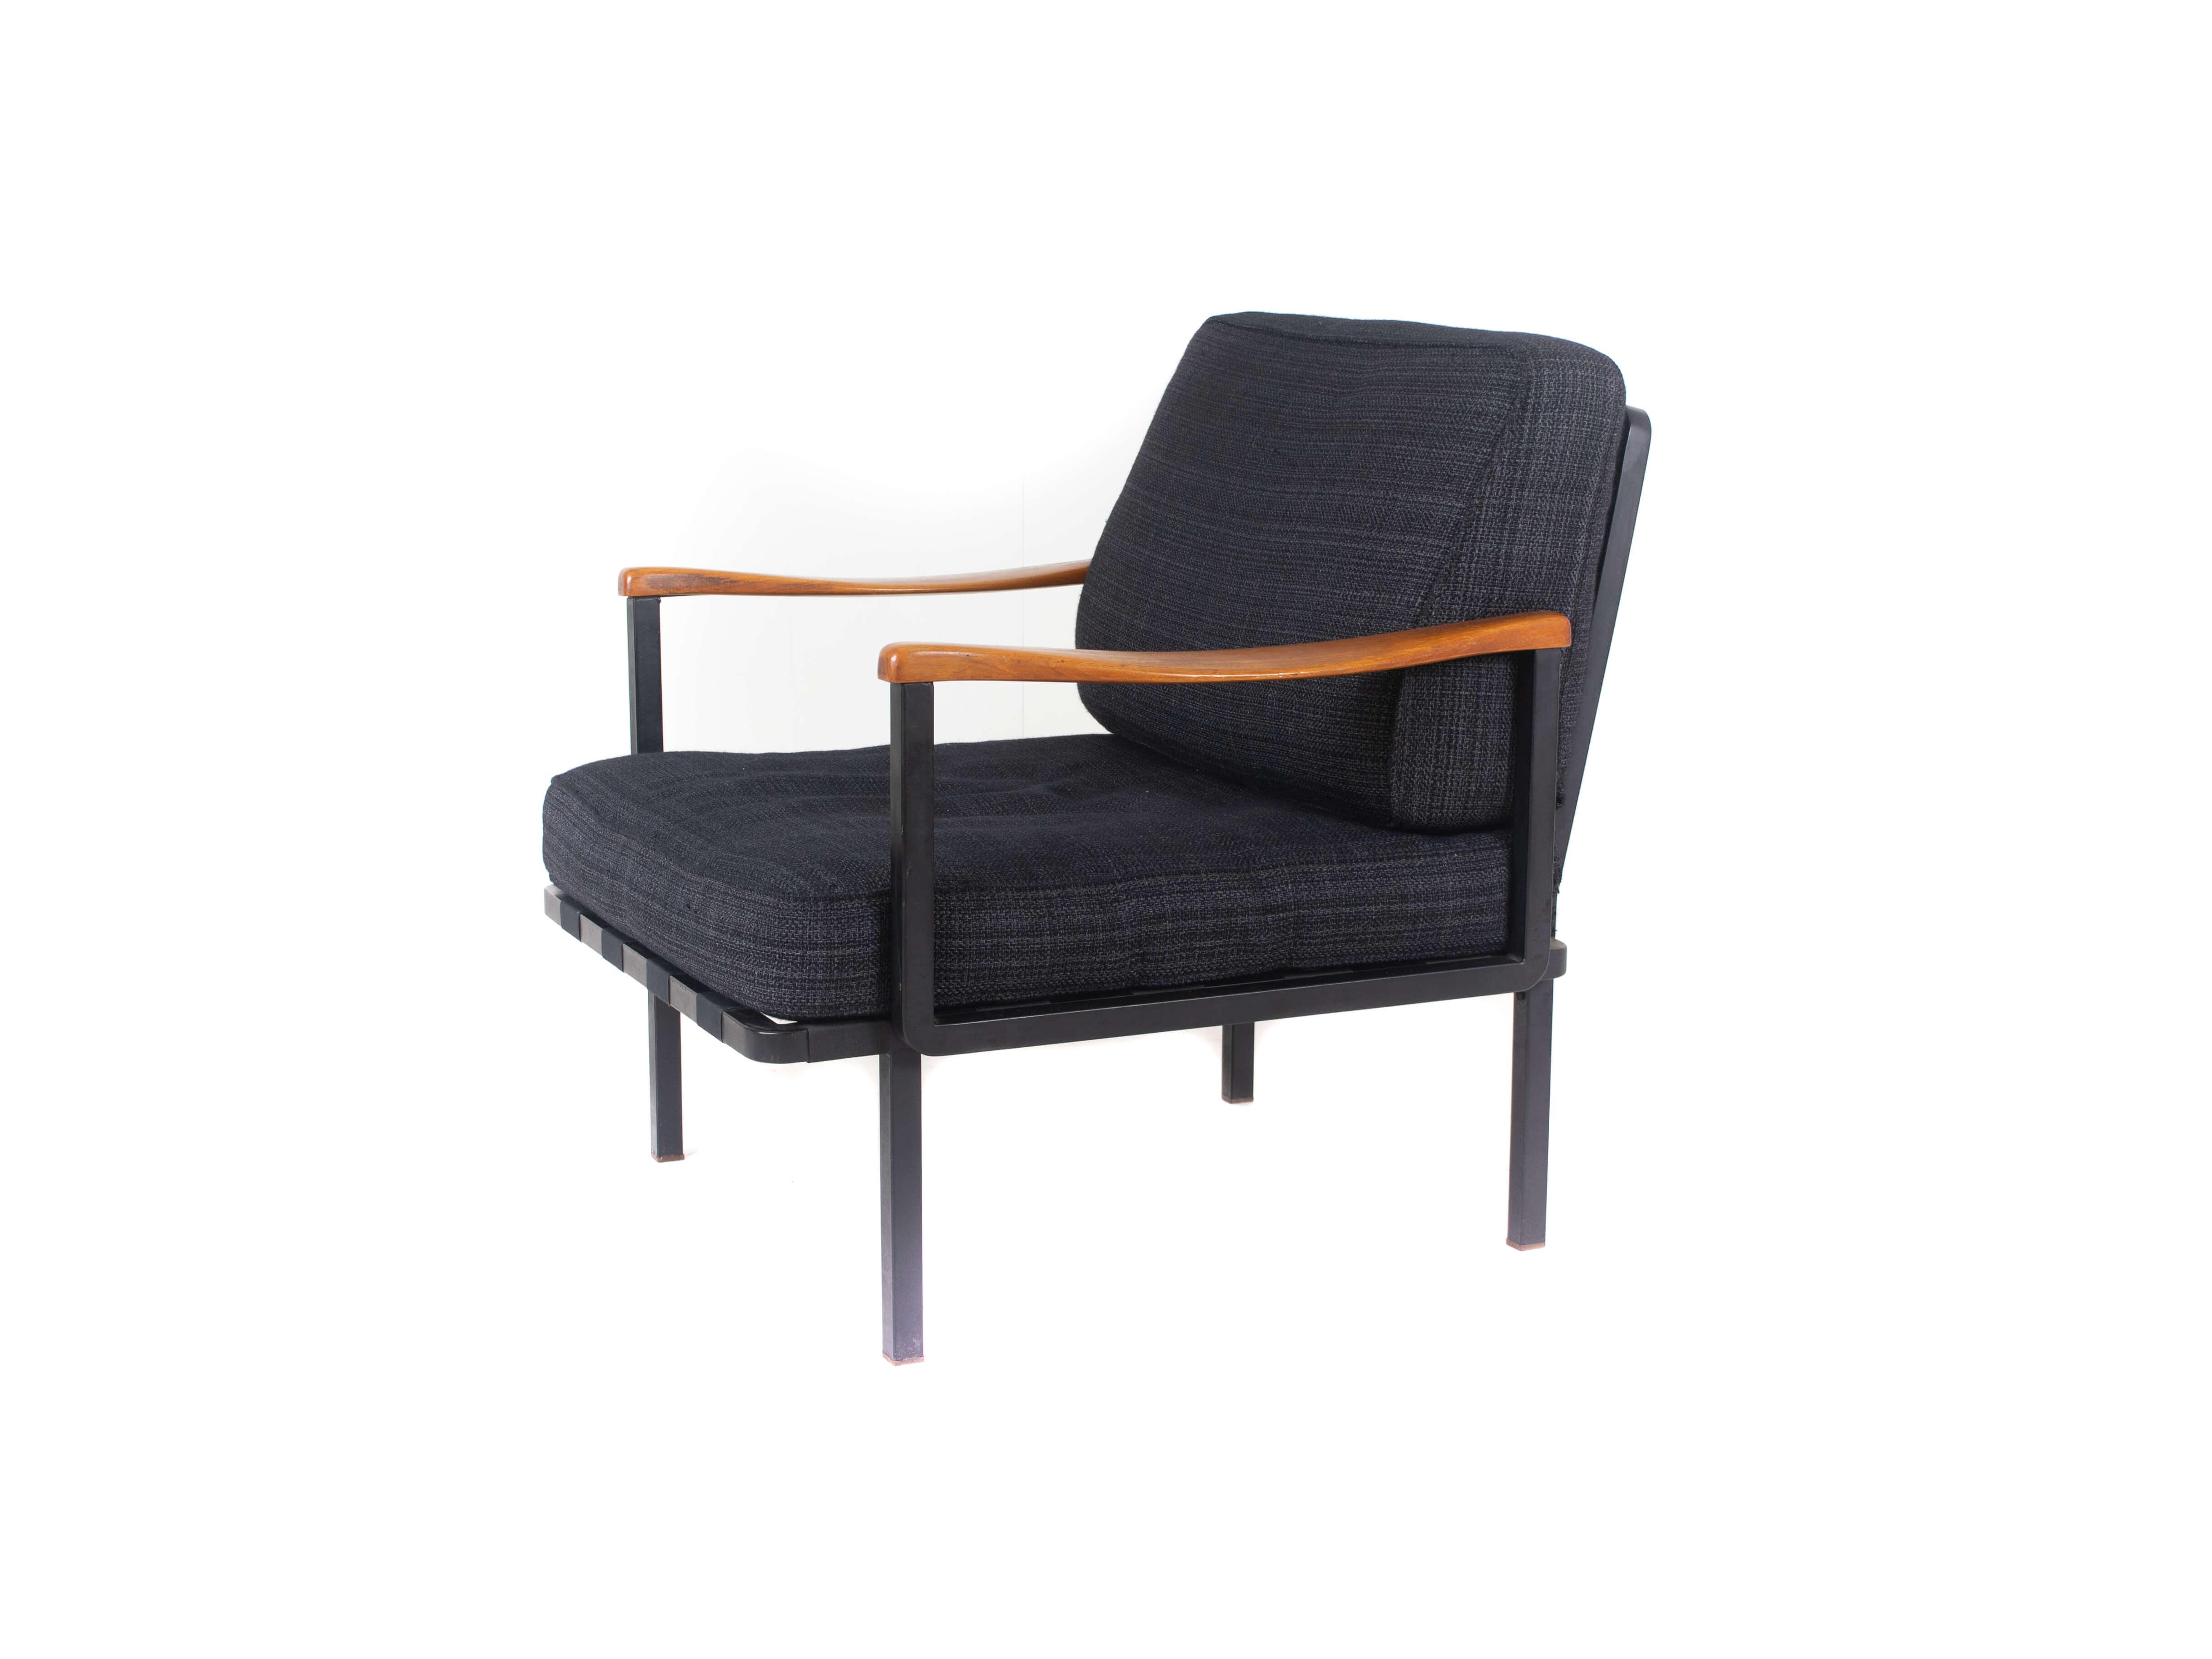 Italian Modern Osvaldo Borsani Arm Chair Model P24 by Tecno, Italy 1961